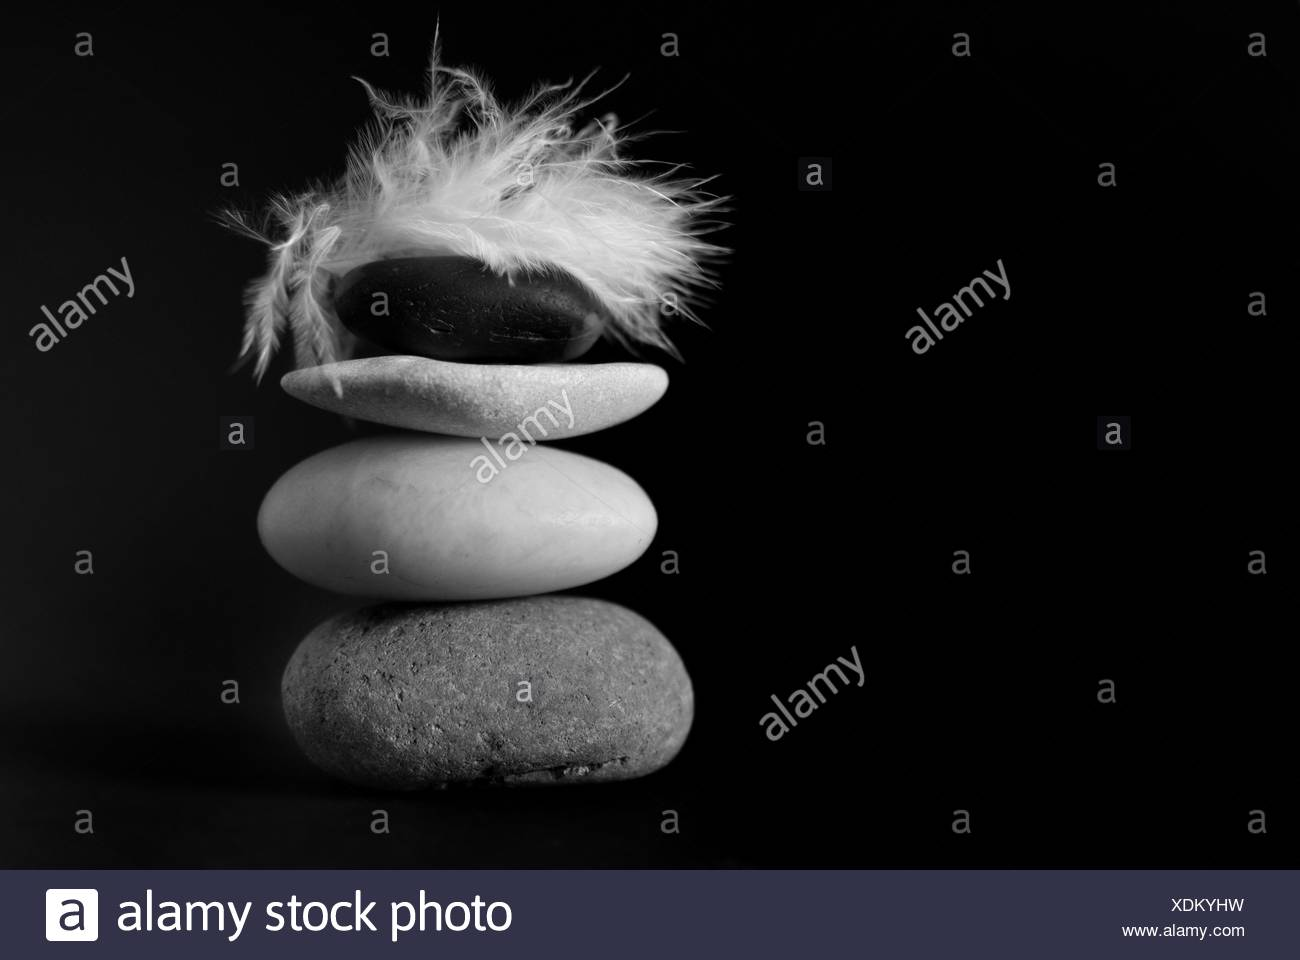 tower health stone bw black swarthy jetblack deep black blank european - Stock Image